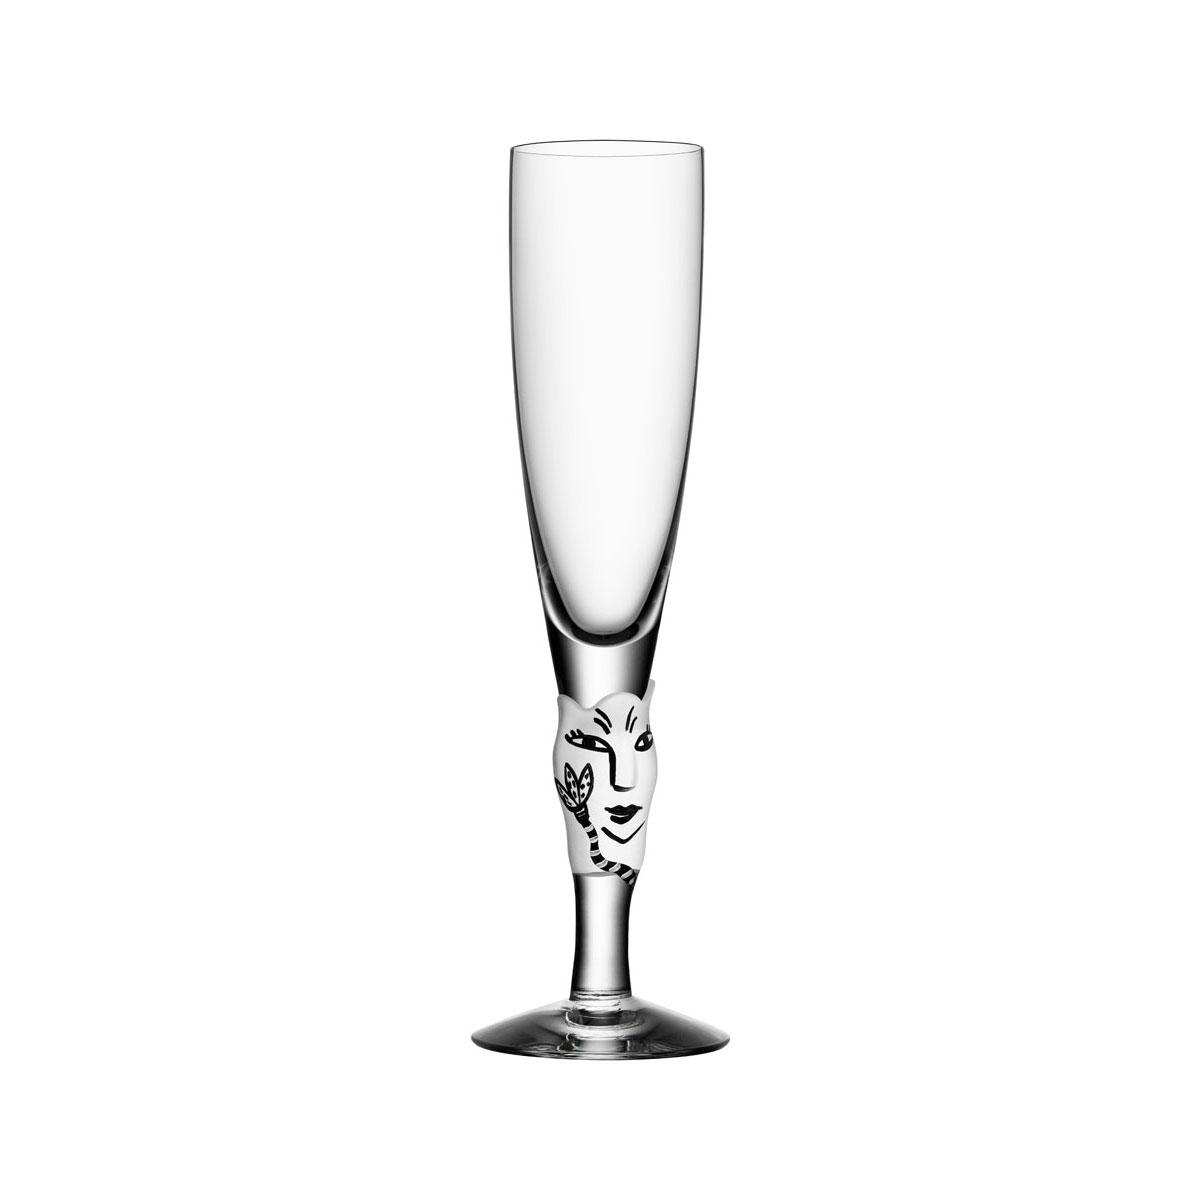 Kosta Boda Open Minds Crystal Champagne, White, Single